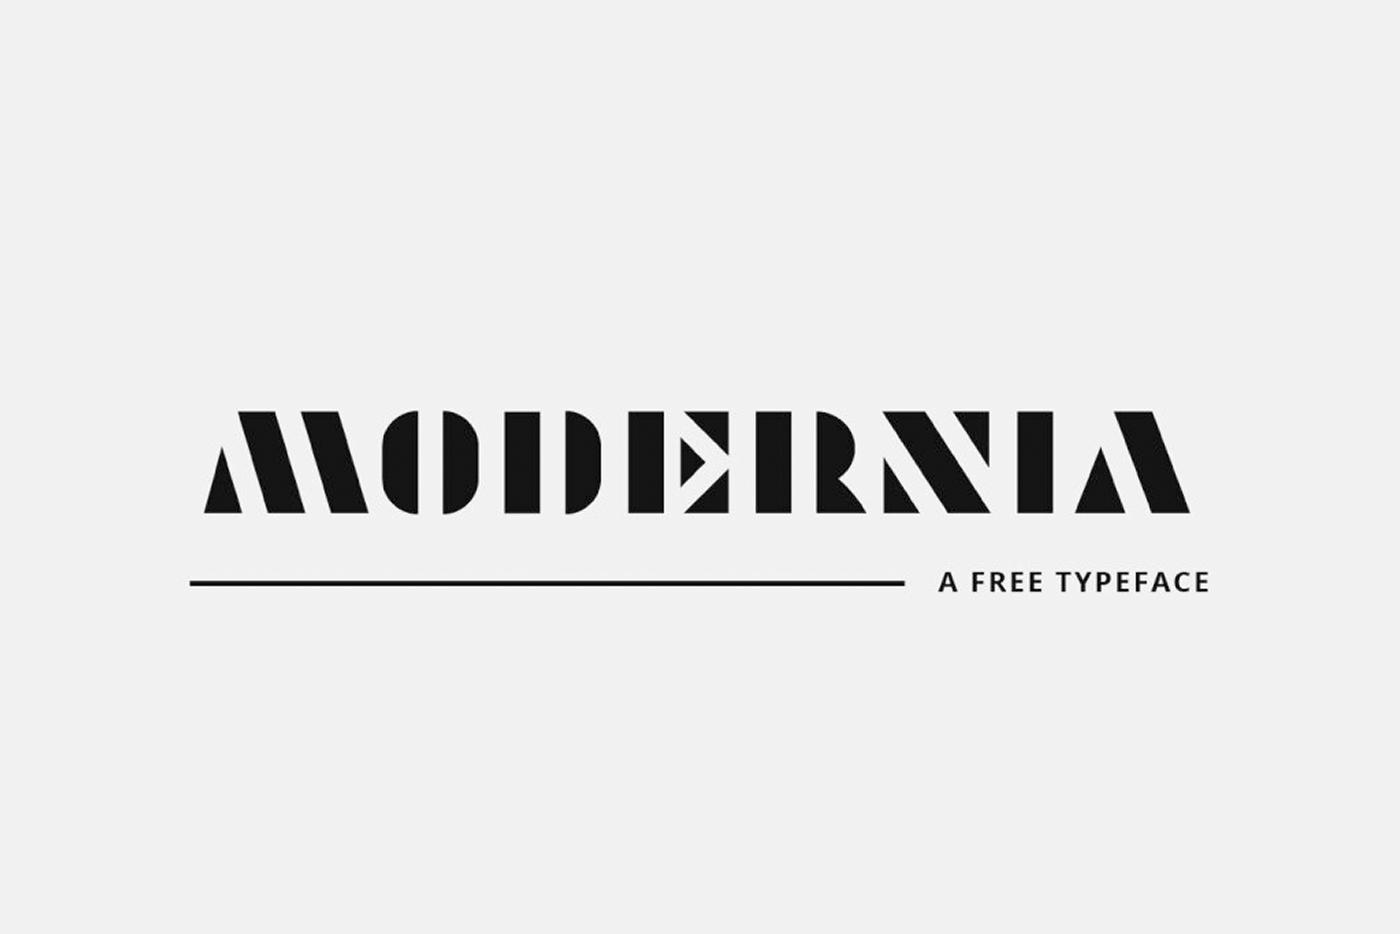 Modernia-Free-Typeface